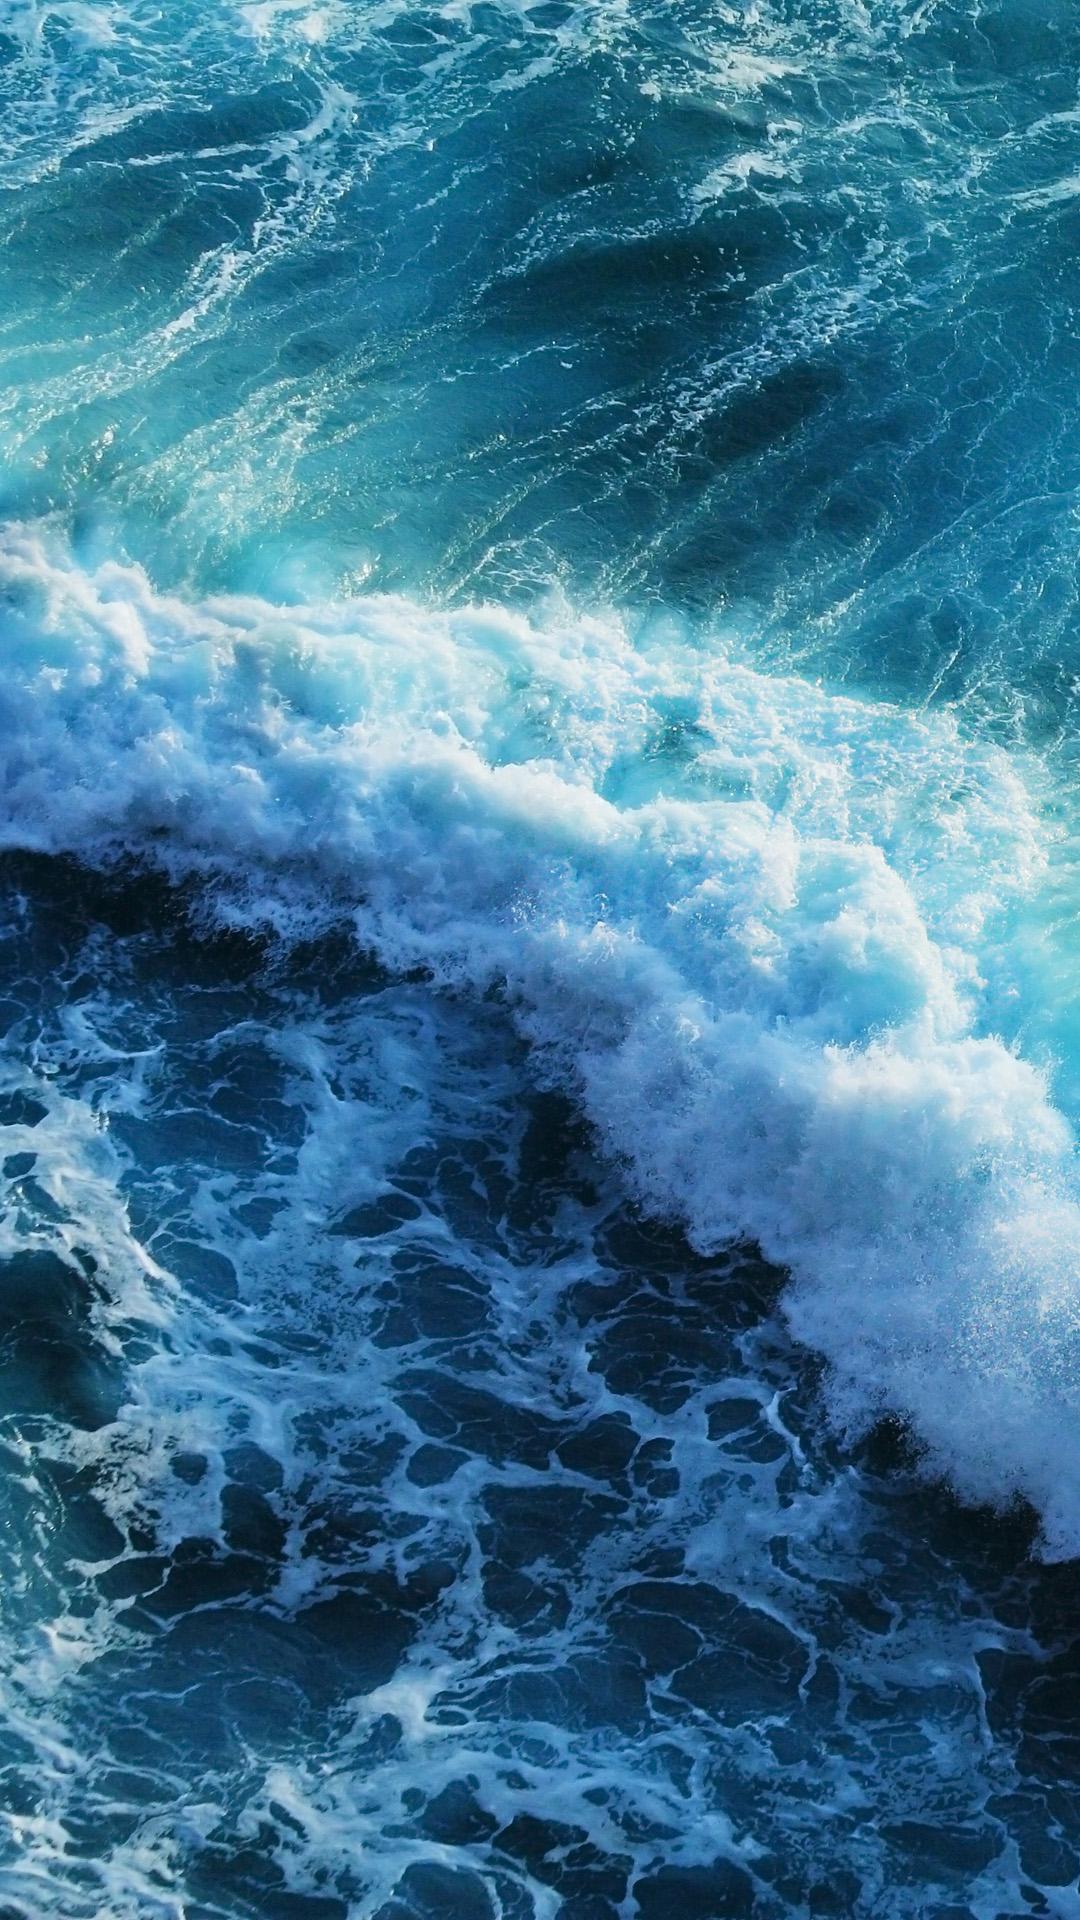 Beautiful blue waves iphone 6 plus wallpaper Wallpapers 1080x1920